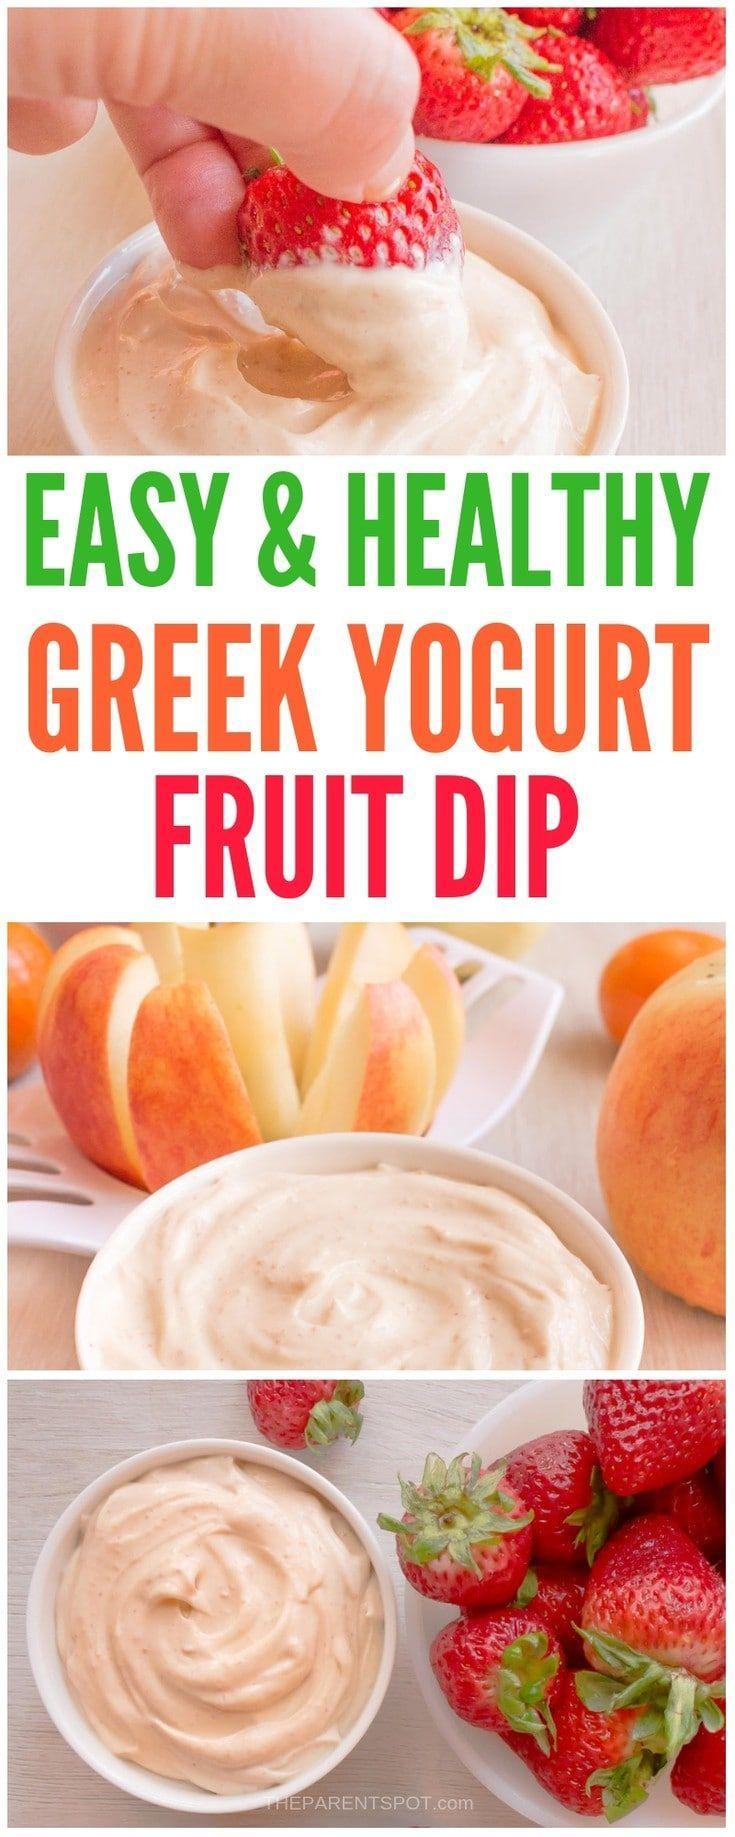 Easy 3 Ingredient Greek Yogurt Fruit Dip Recipe With Peanut Butter Recipe Healthy Greek Yogurt Dip Peanut Recipes Healthy Greek Yogurt